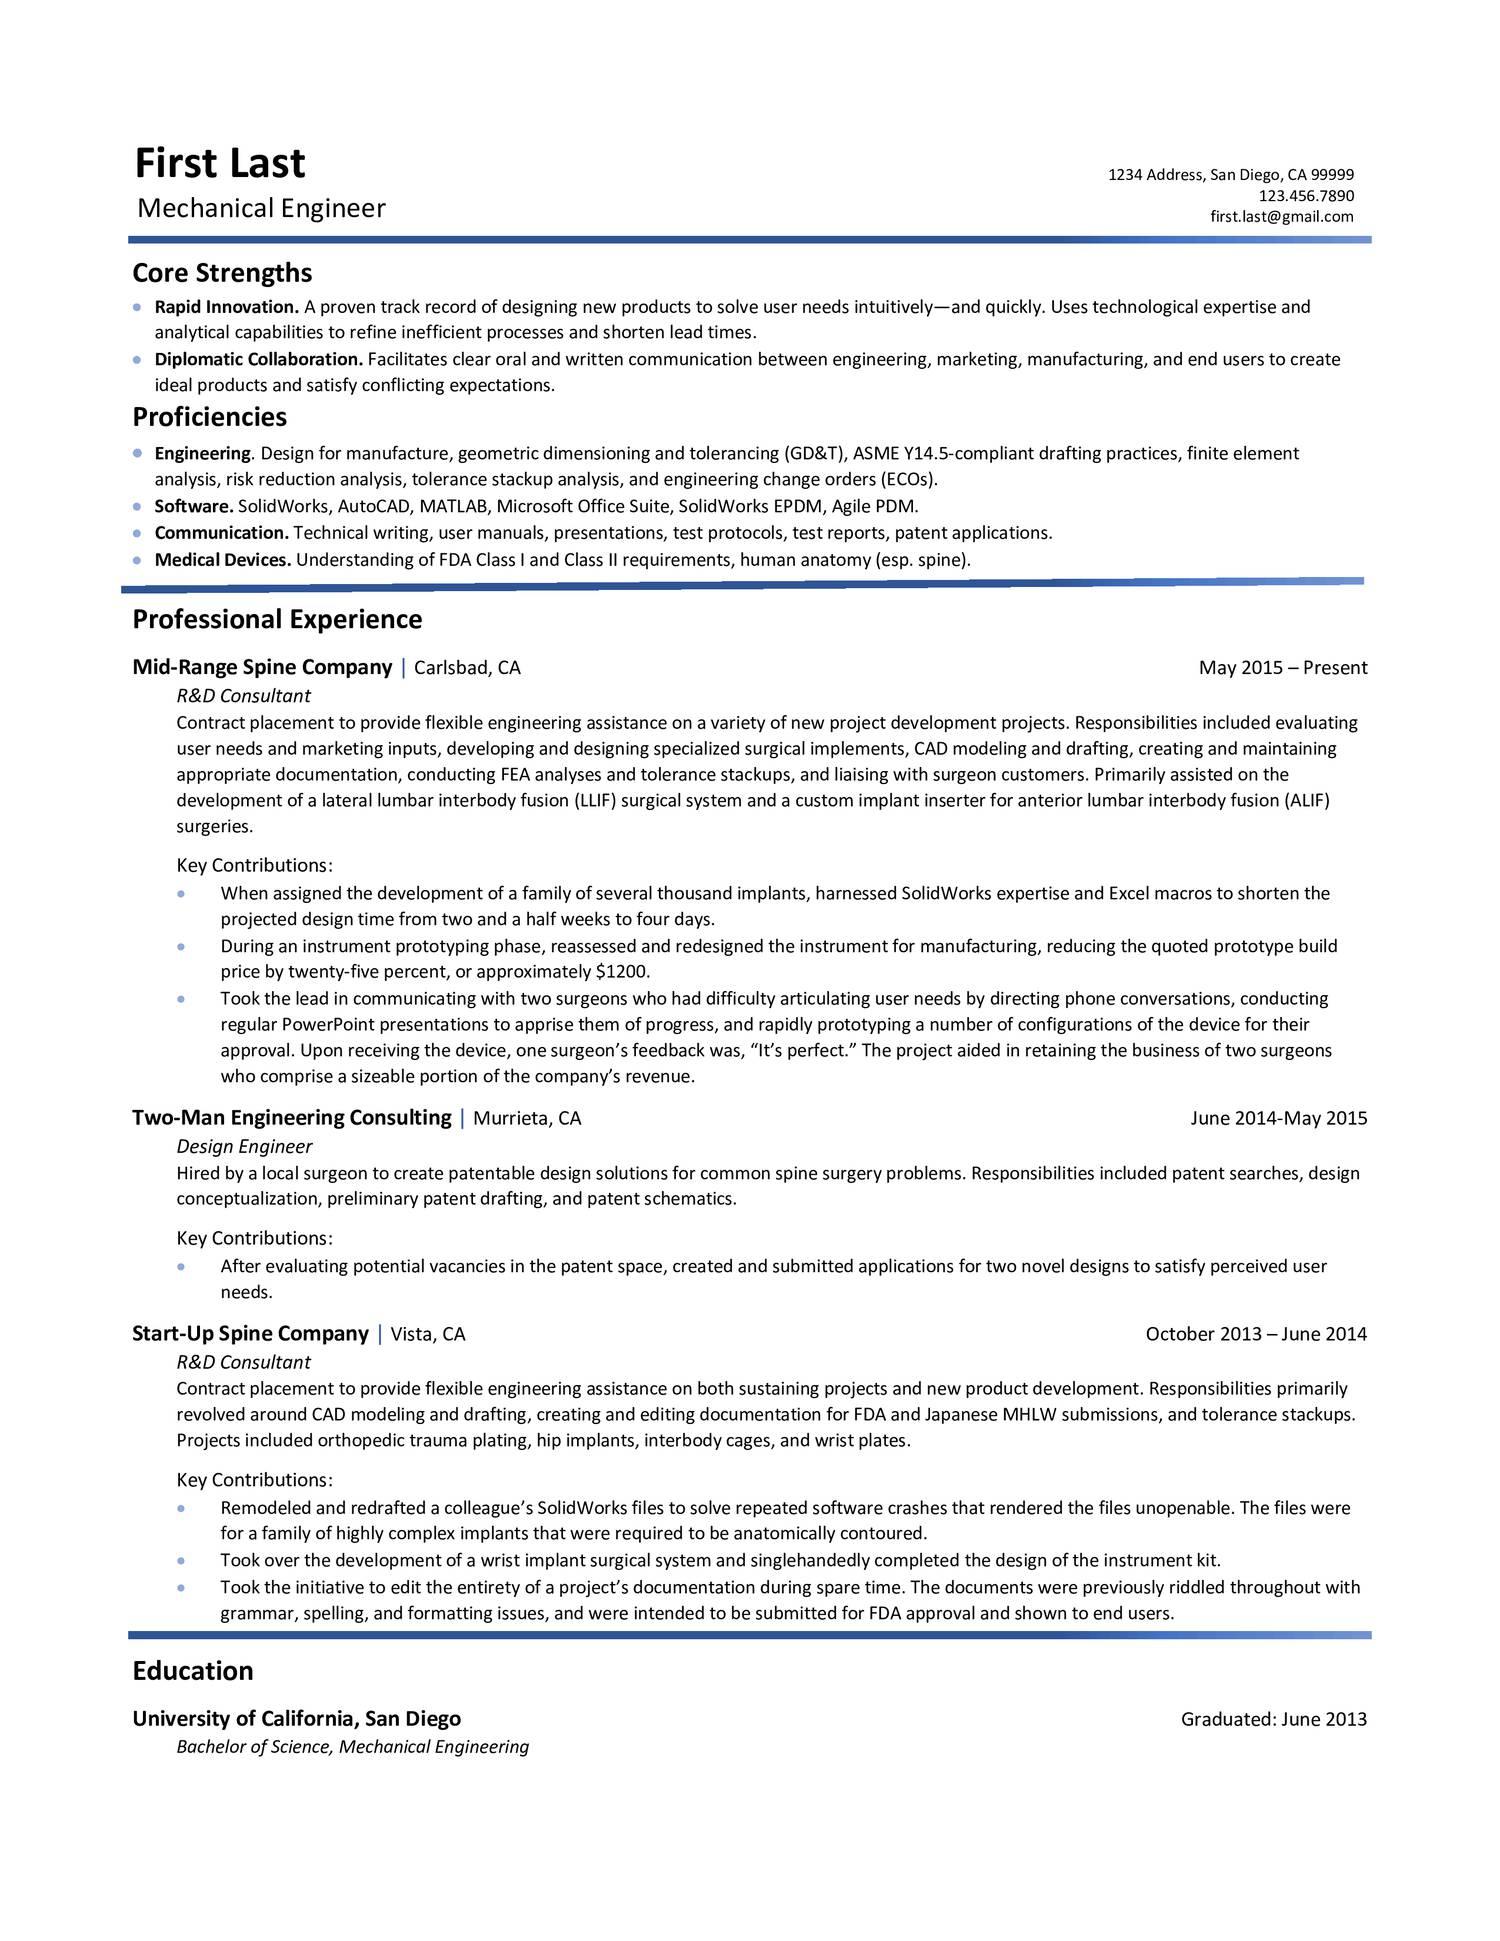 Anonymous Reddit Resume - Oct 26 2016.pdf - DocDroid